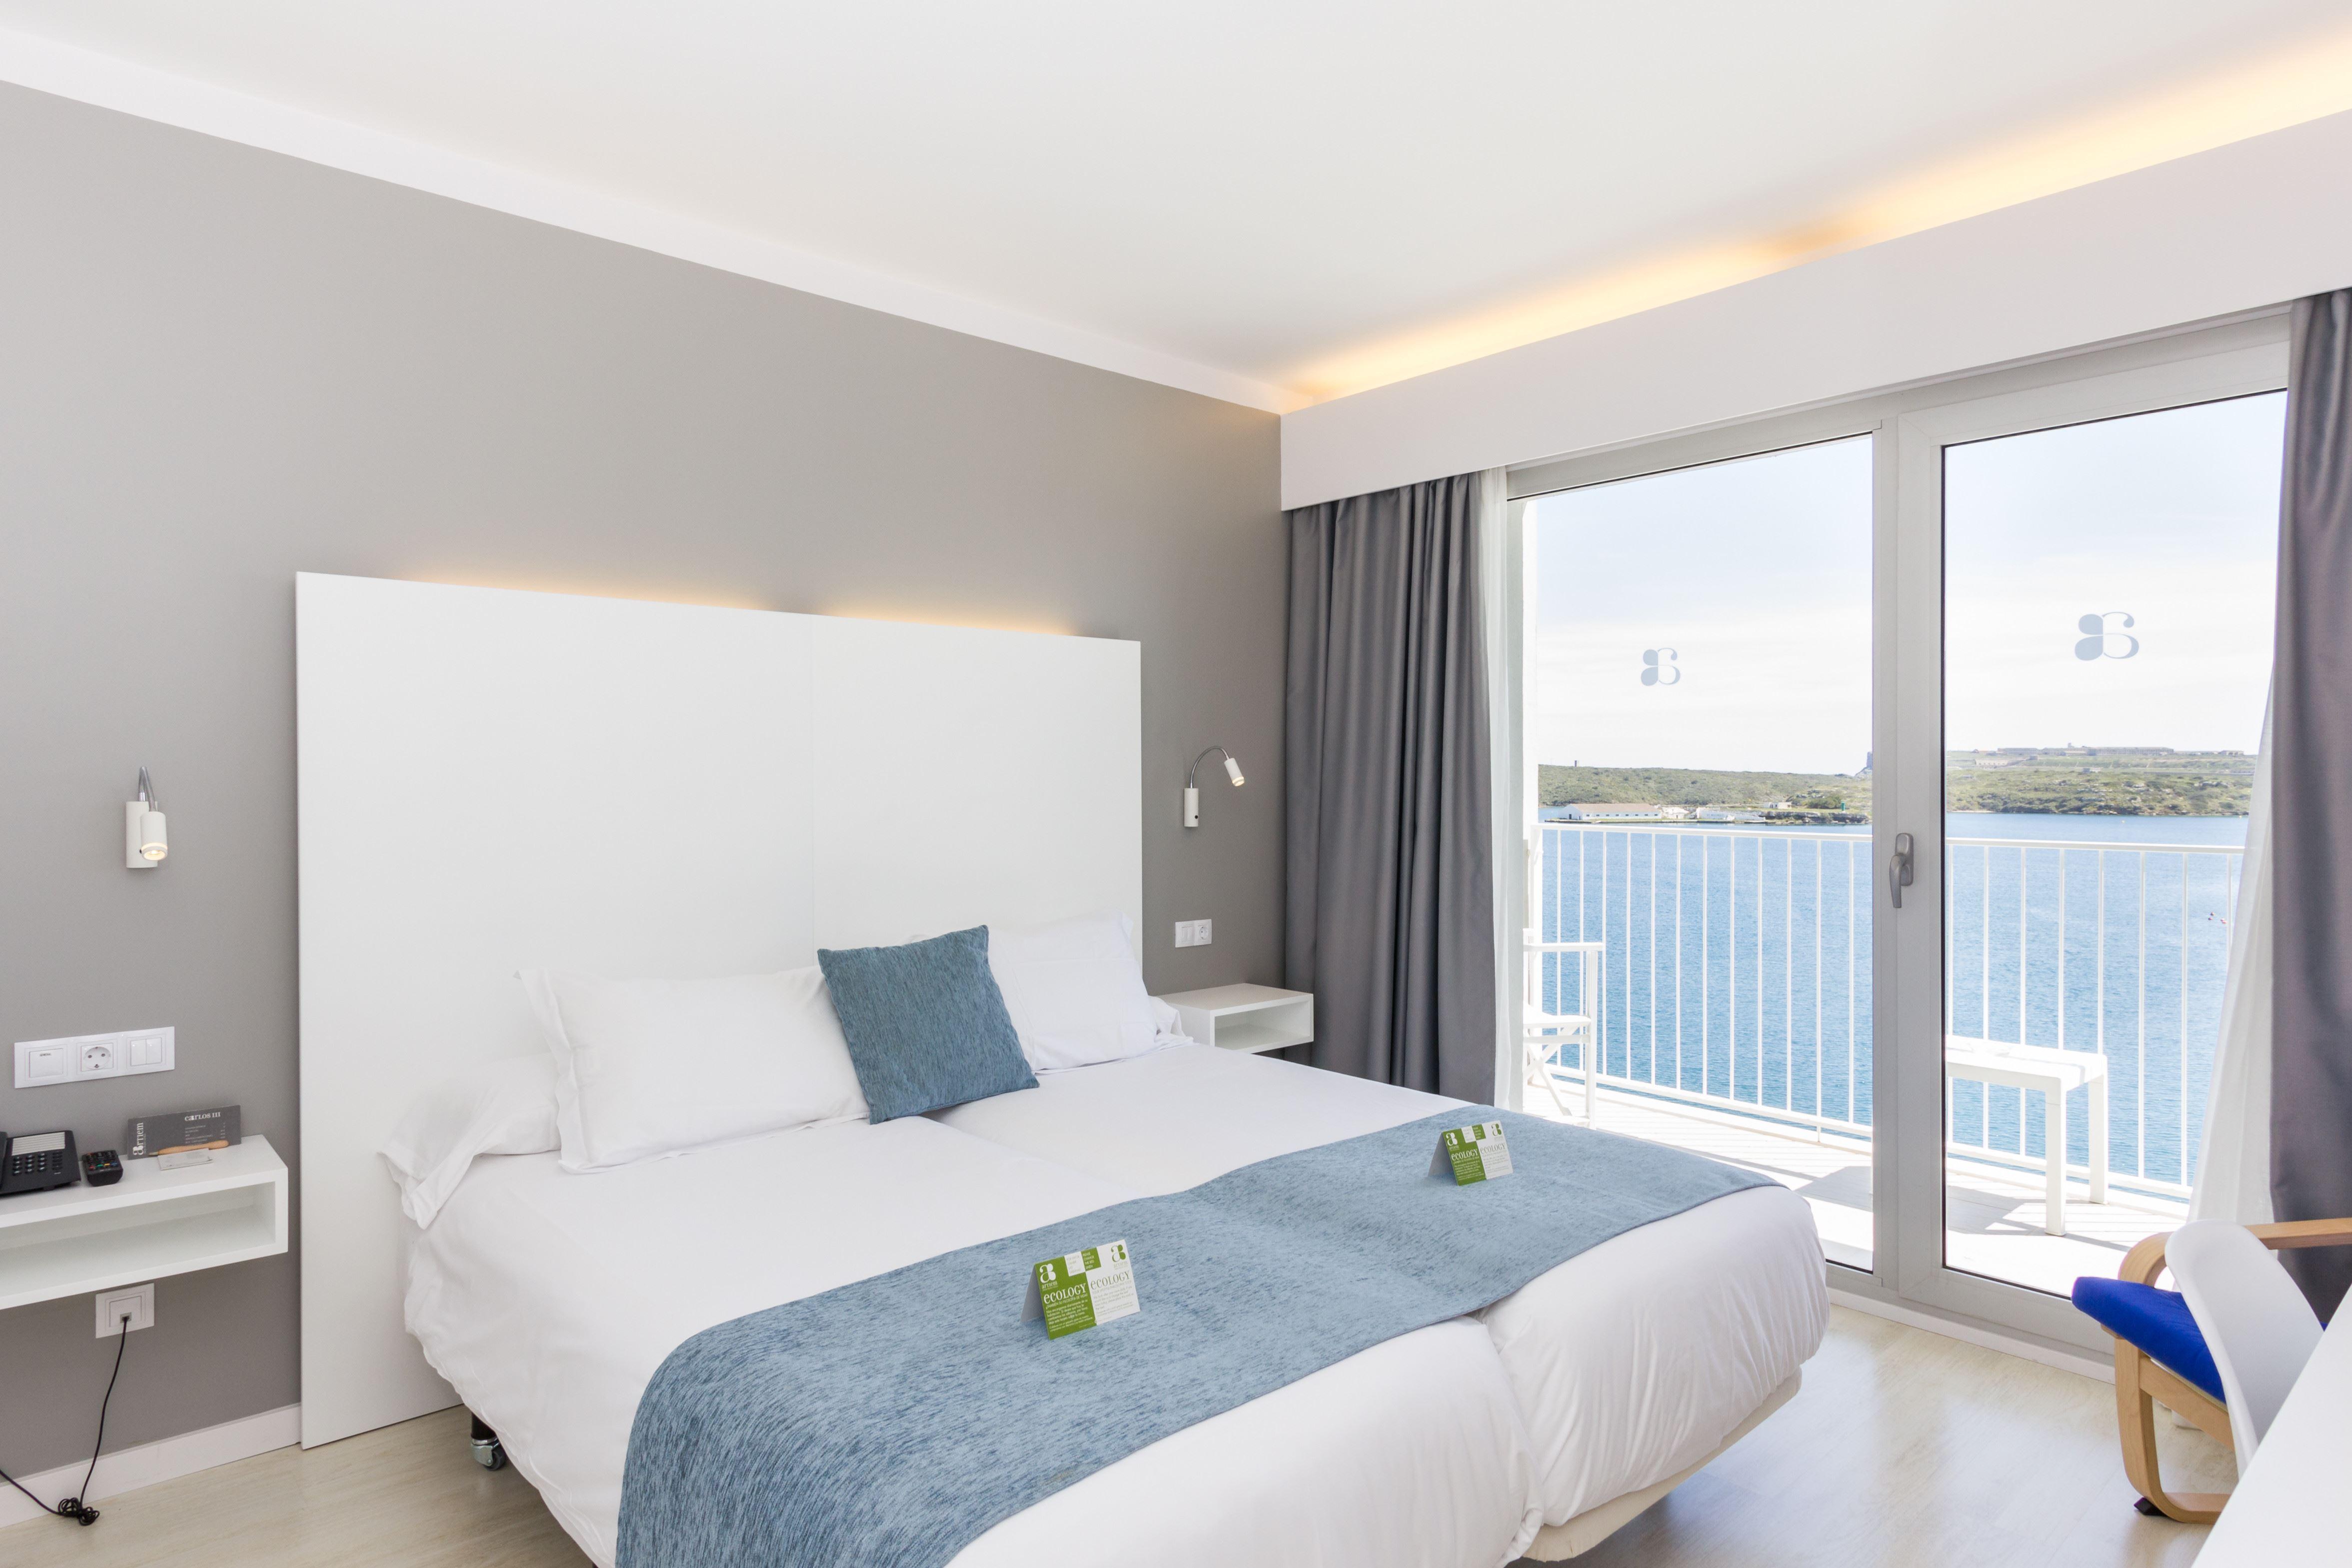 Dubbelrum, Hotell Artiem Carlos III, Es Castell, Menorca, Signaturresor